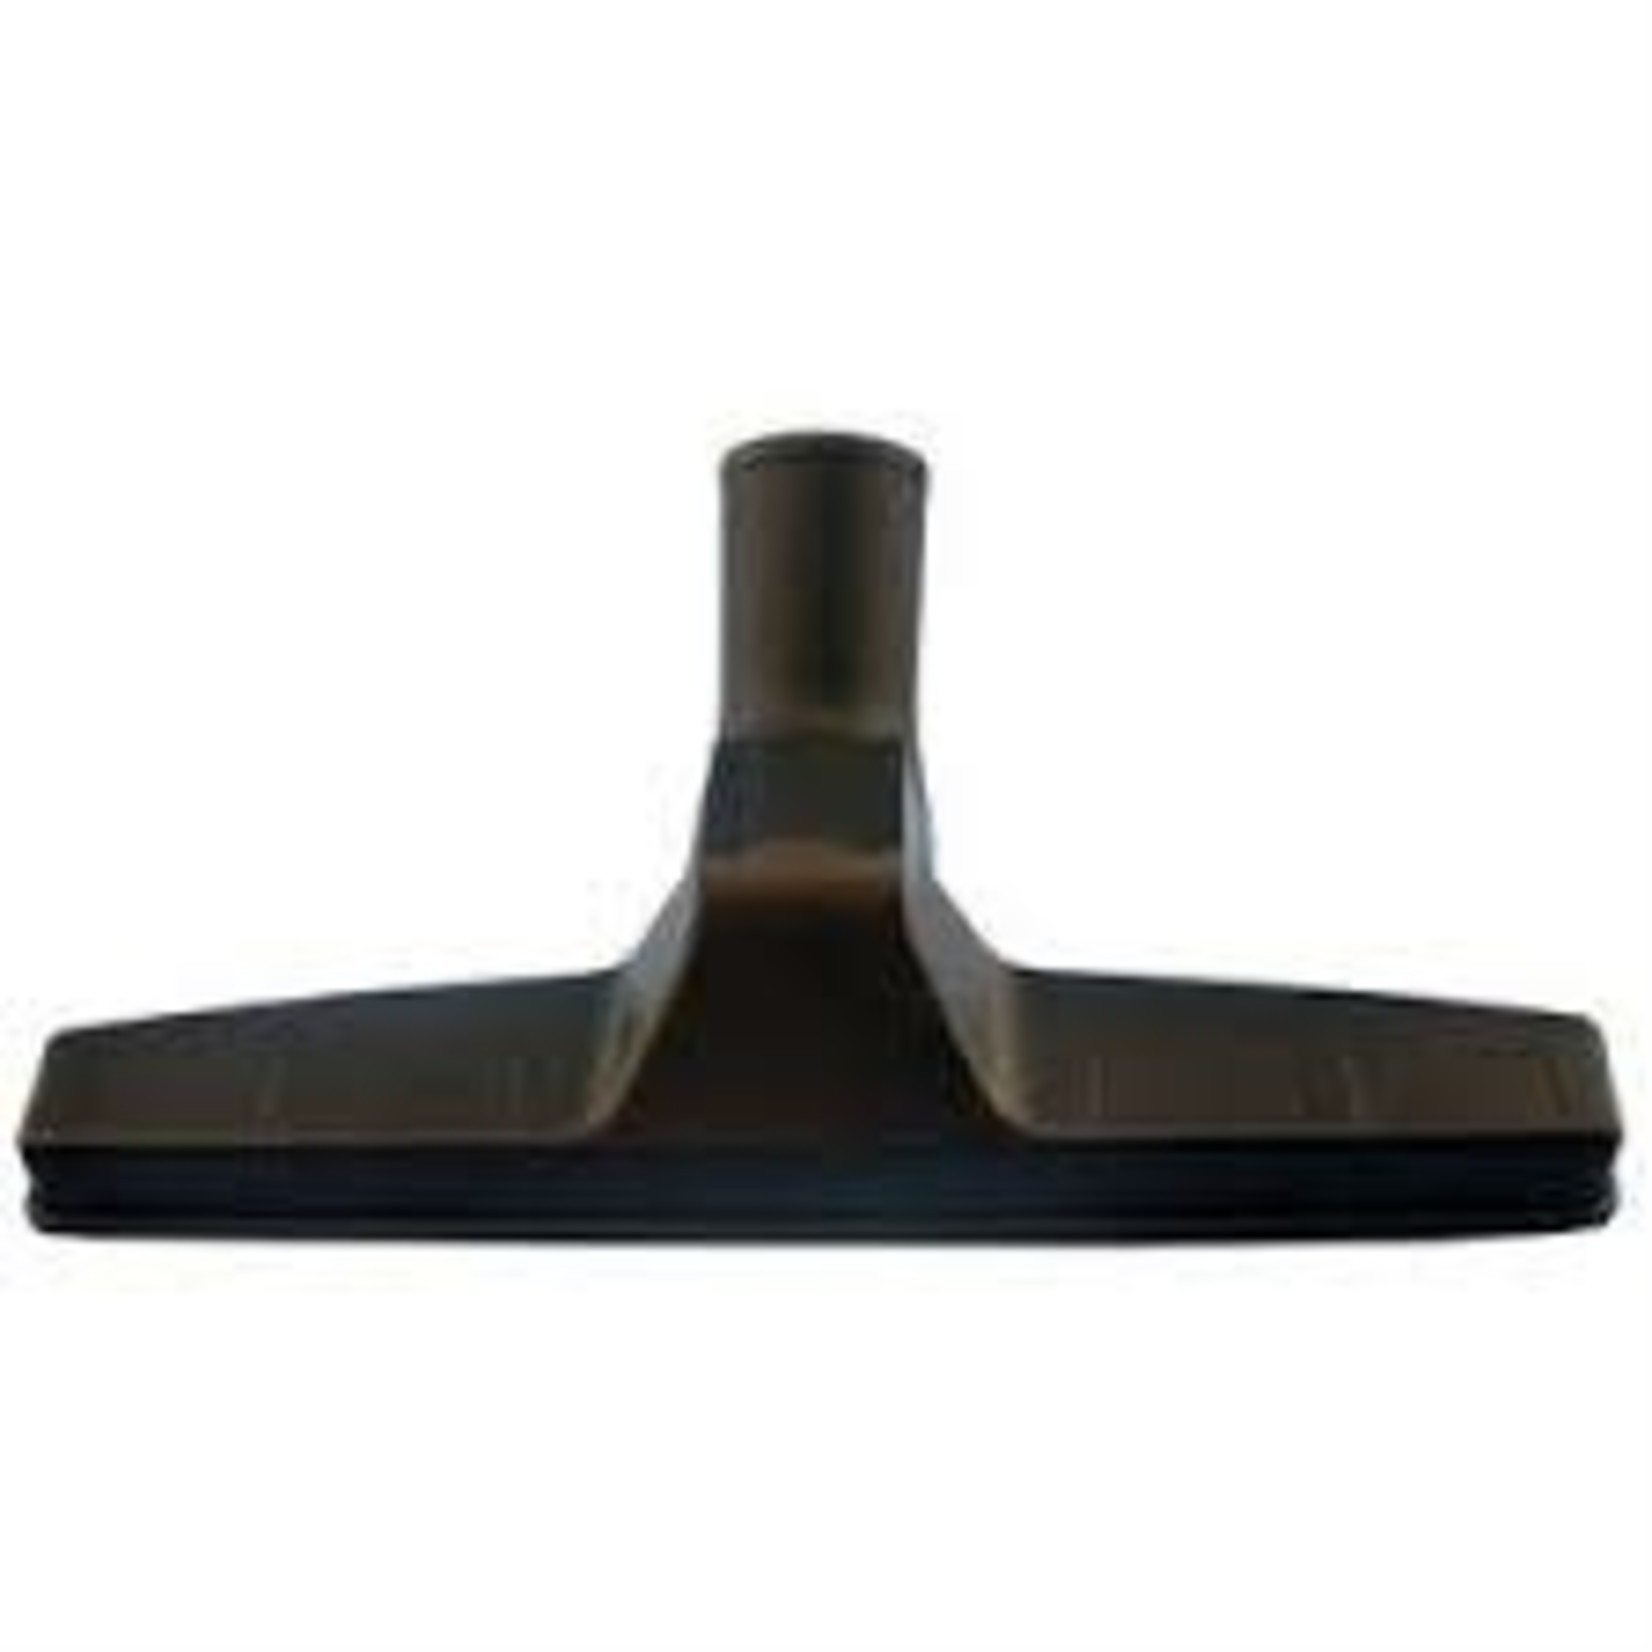 BEAM Beam Black Rug Tool W/Plastic Neck